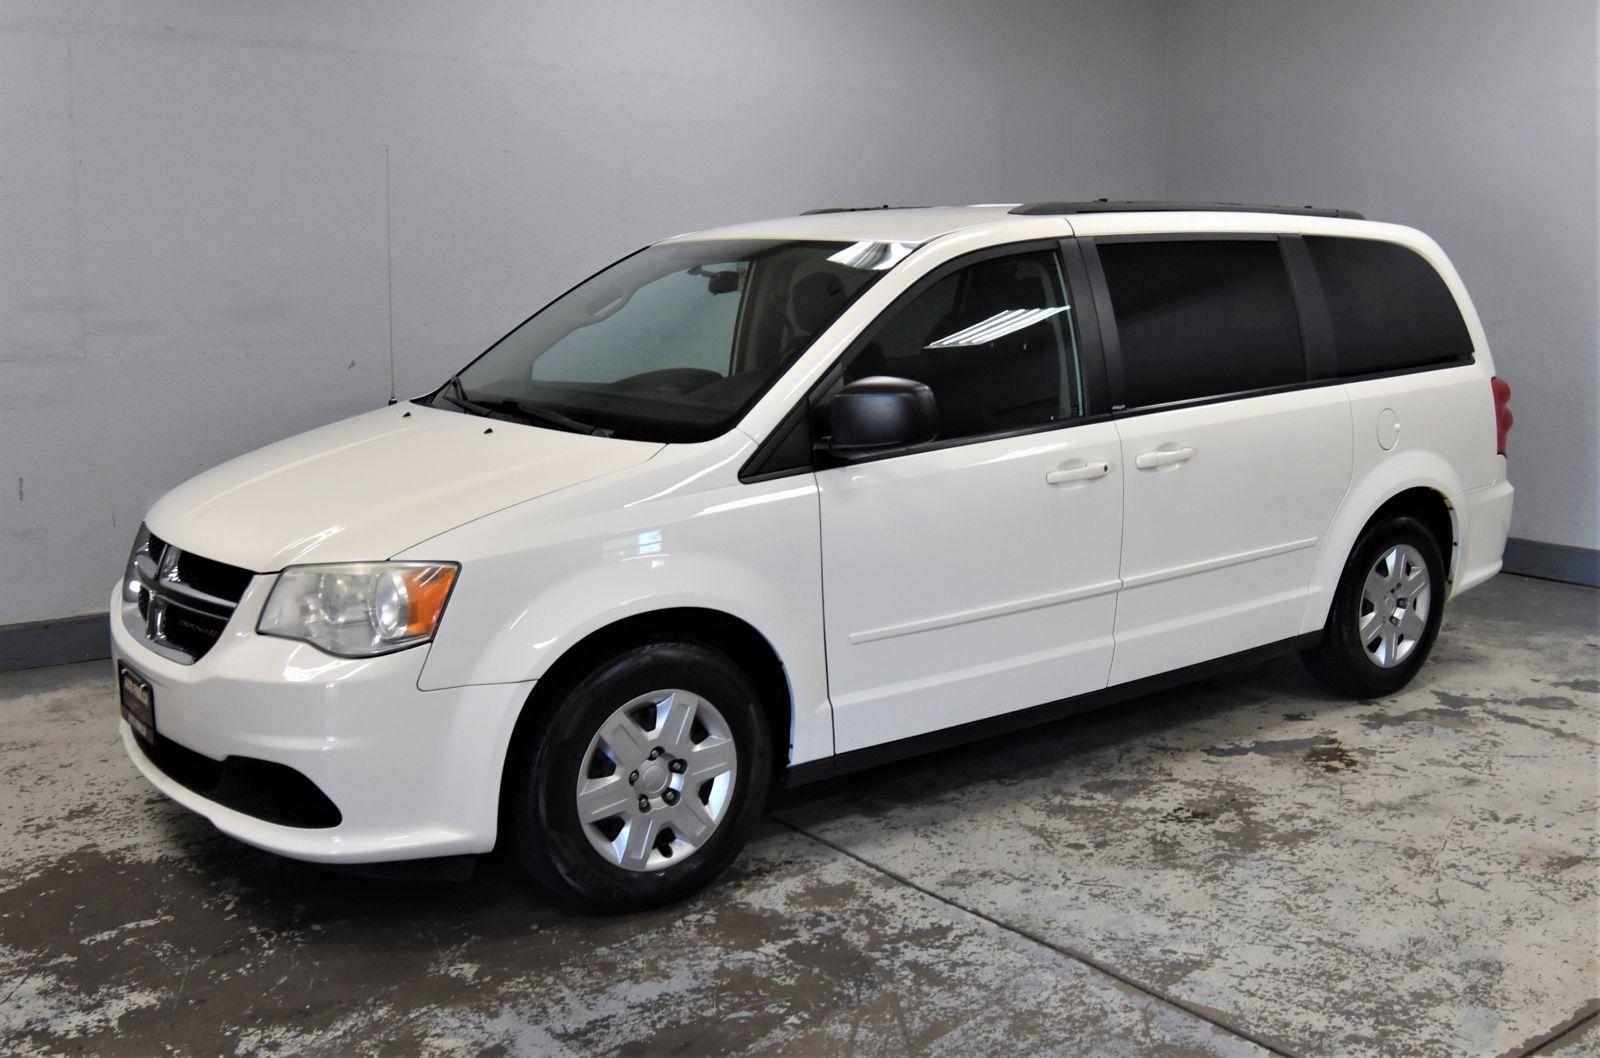 2013 Dodge Grand Caravan Image